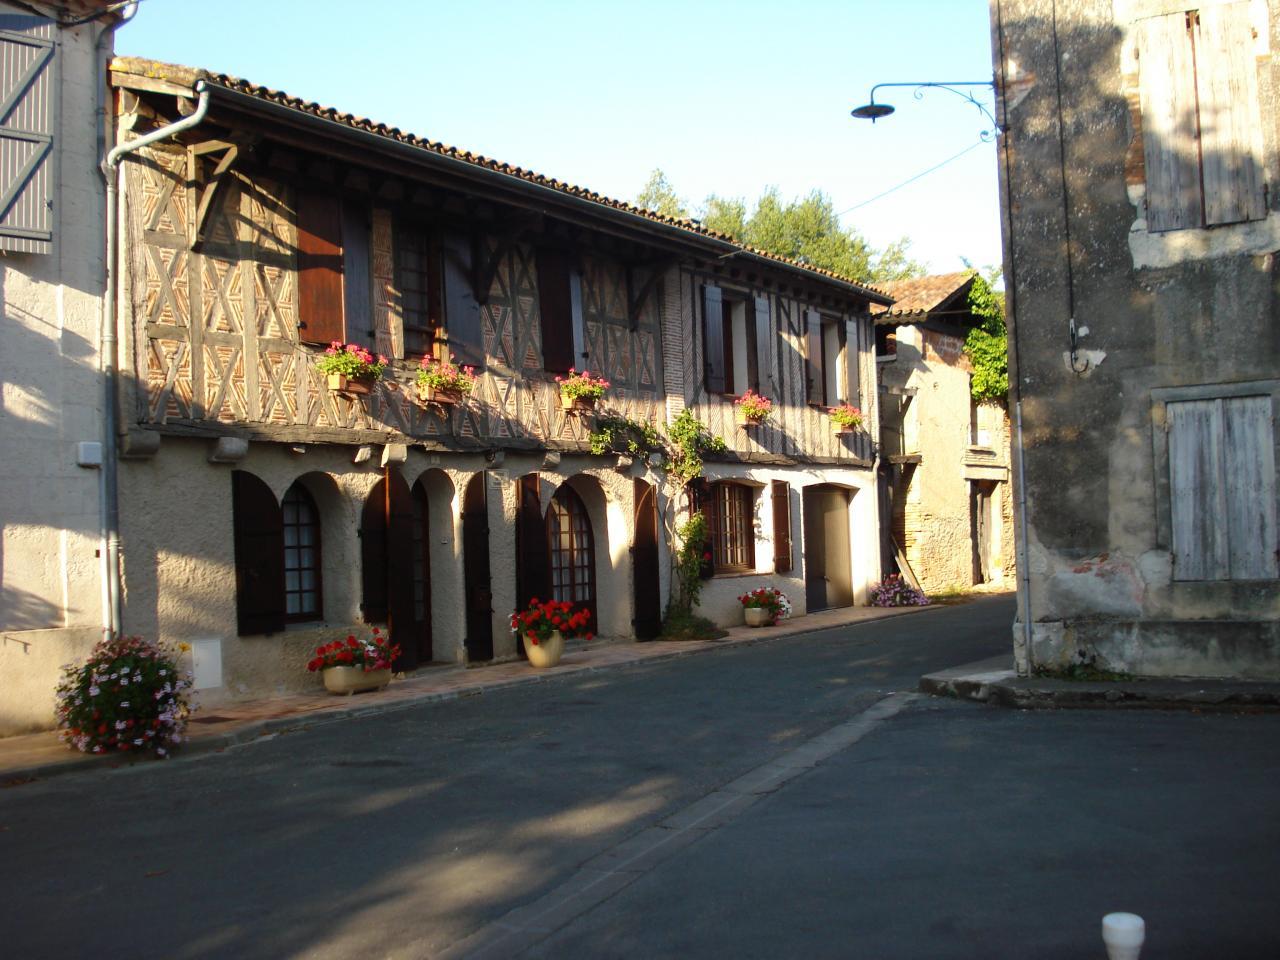 Rue de la Tannerie